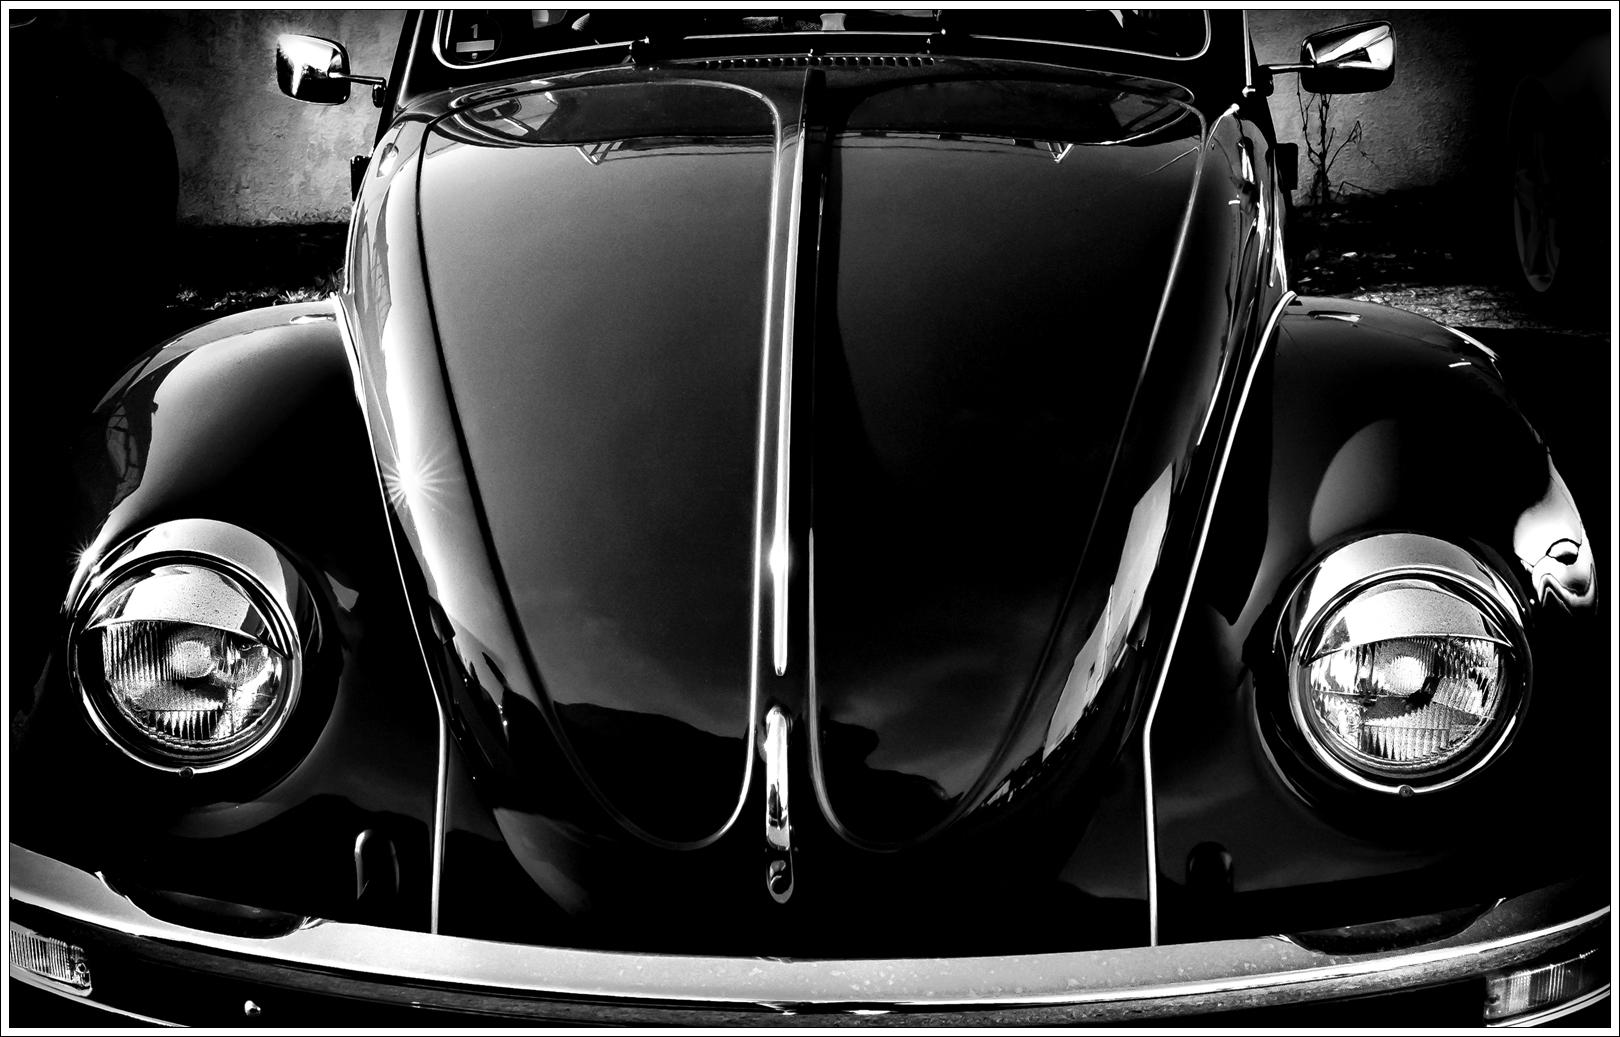 Vintage Car Classic Blackandwhite Bw Automobile Vw Graphics Computer Wallpaper Black And White Monochrome Photography Automotive Design